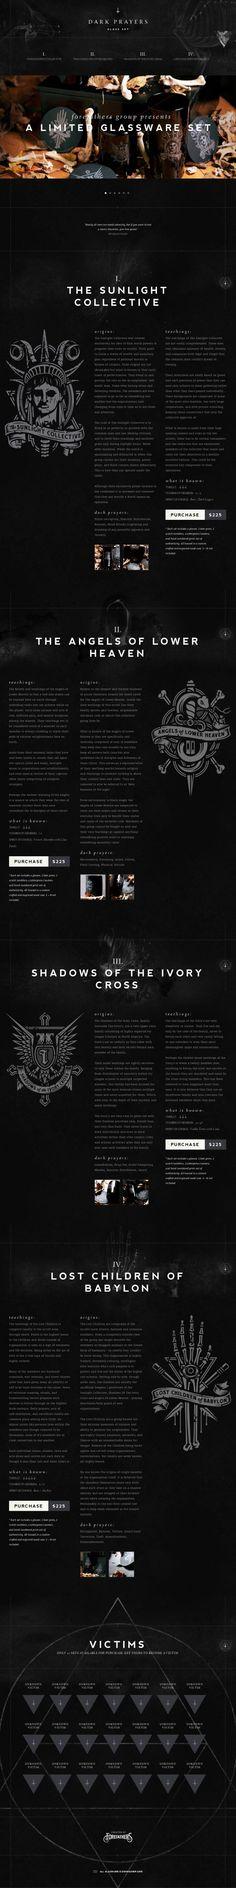 Dark Prayers - A Limited Black Glassware Set - Best website, web design inspiration showcase